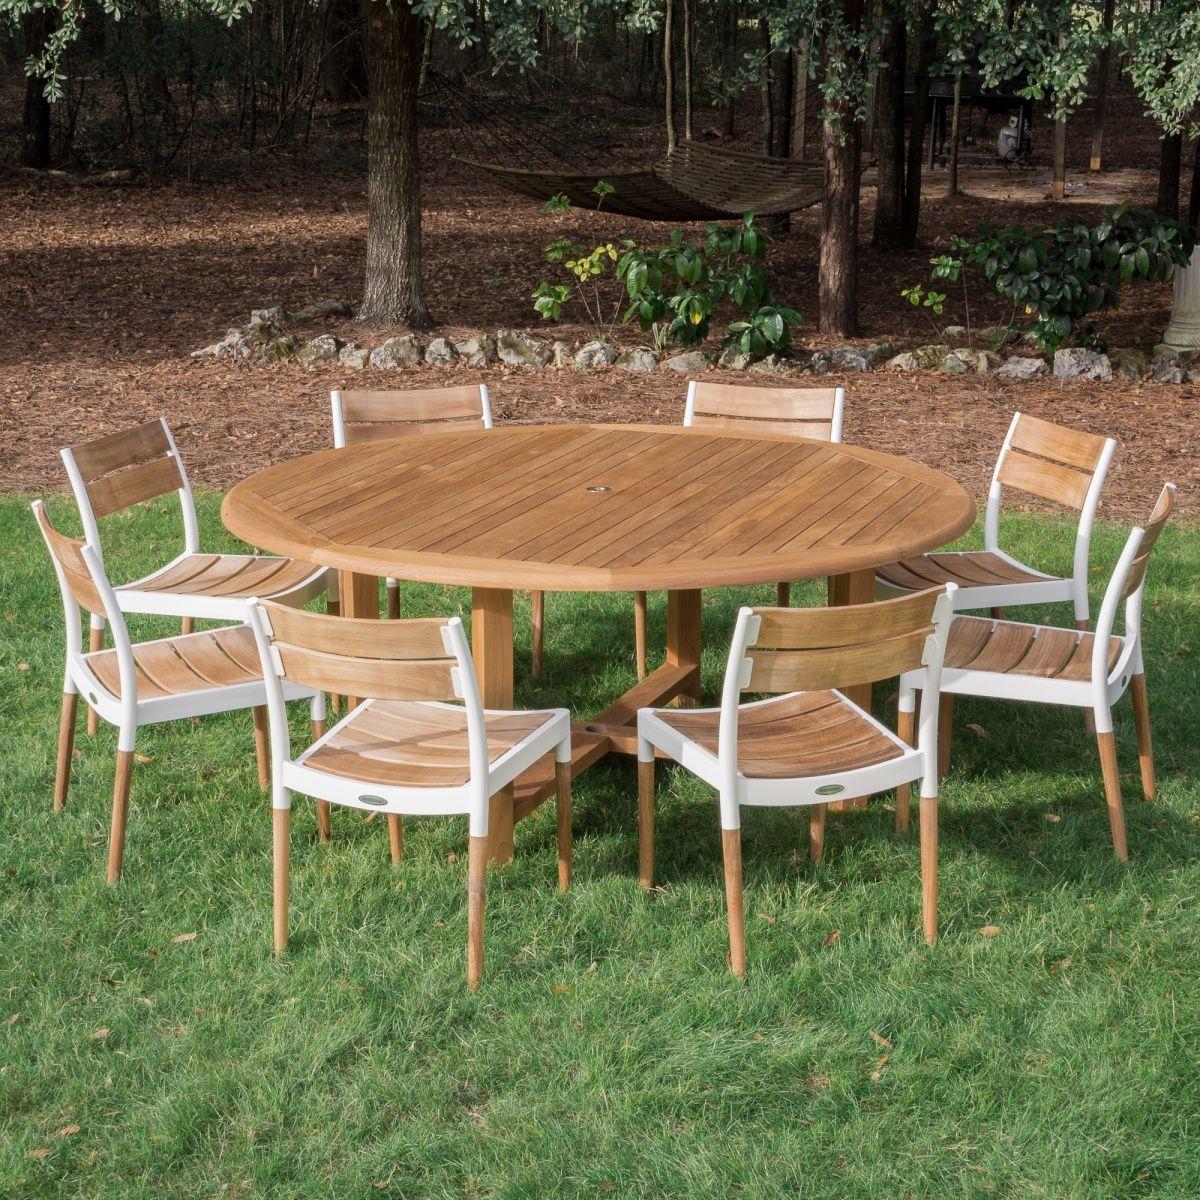 Buckingham Teak Table Westminster Teak Outdoor Furniture Sets